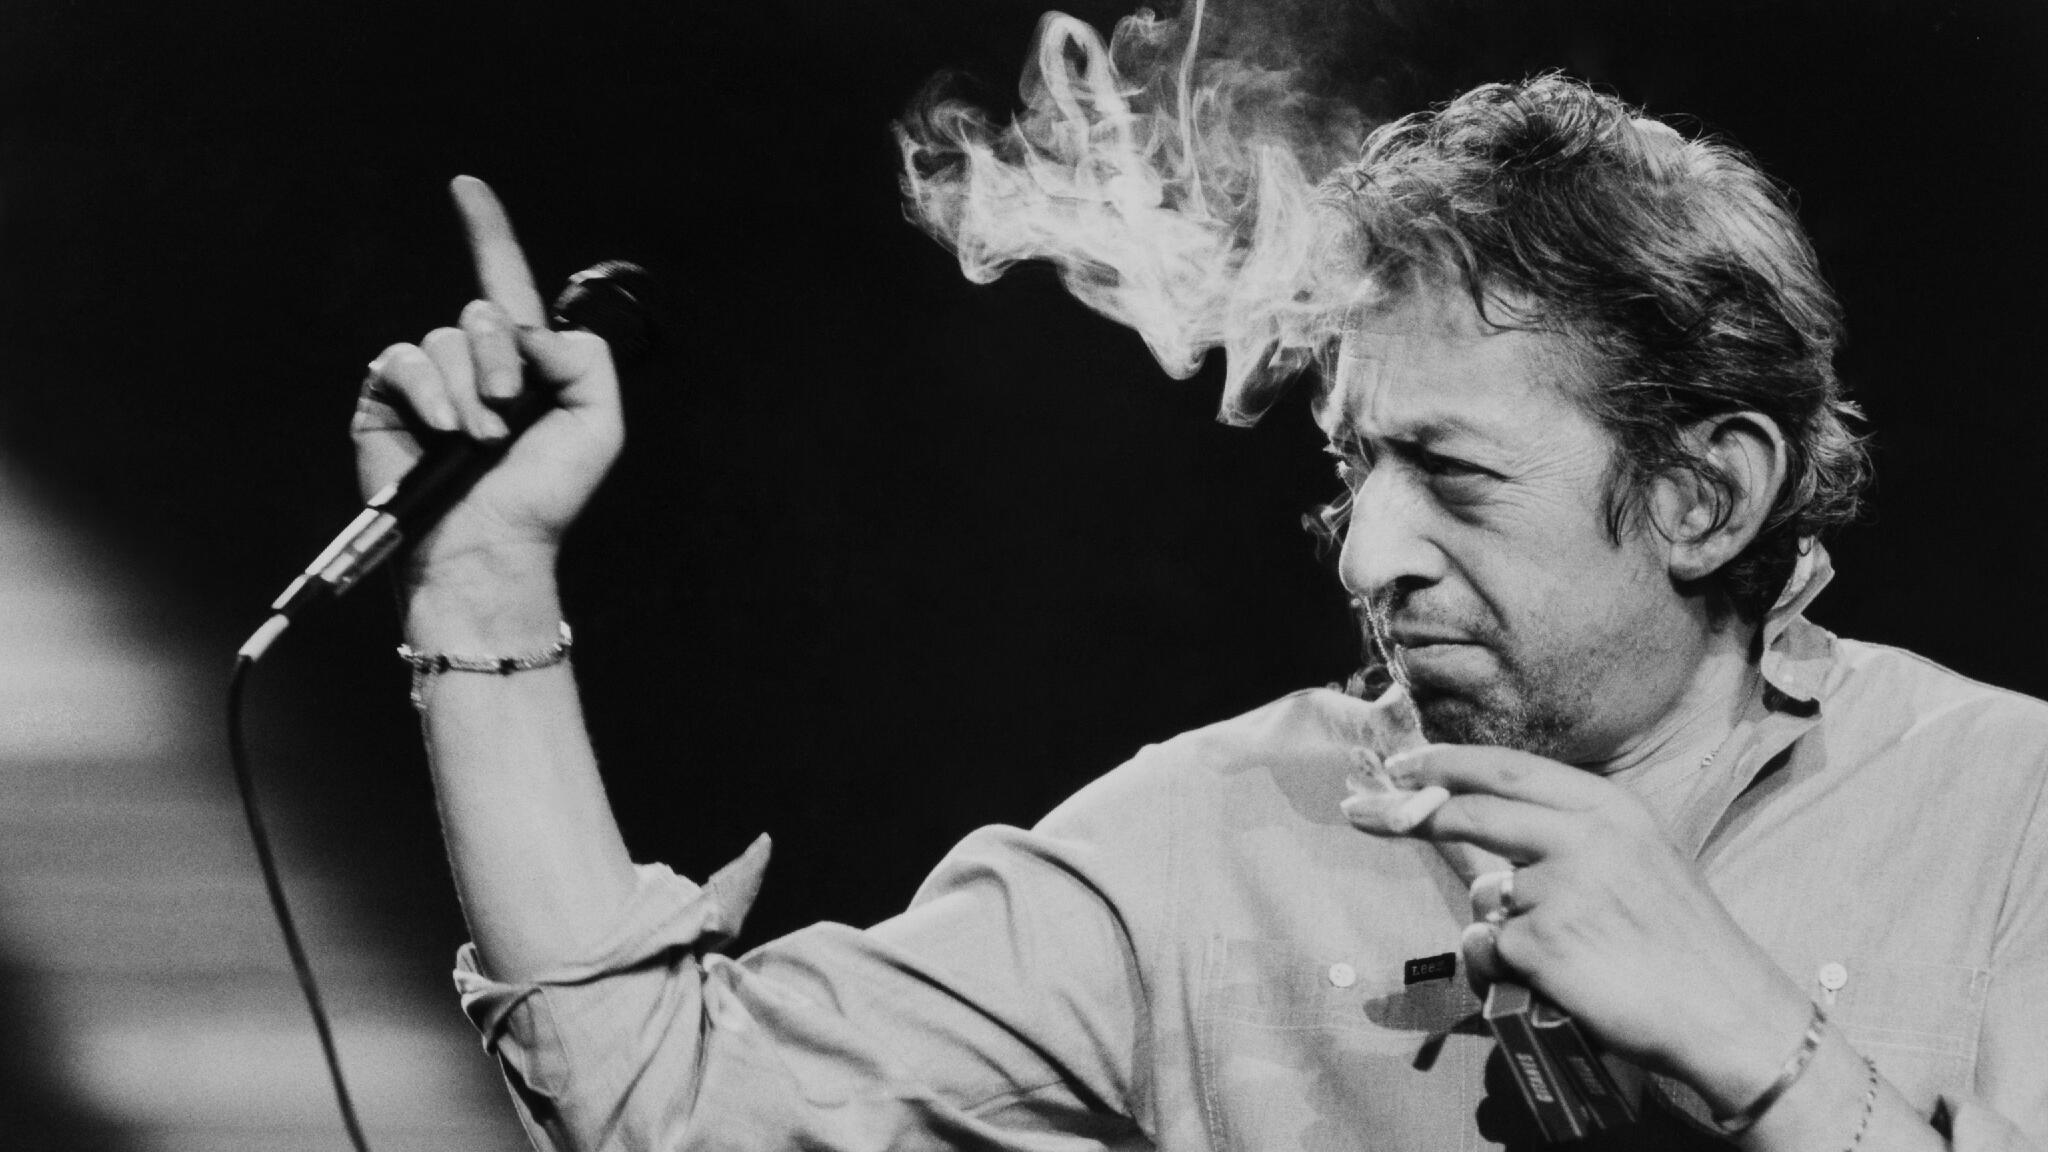 musique - Serge Gainsbourg 1985